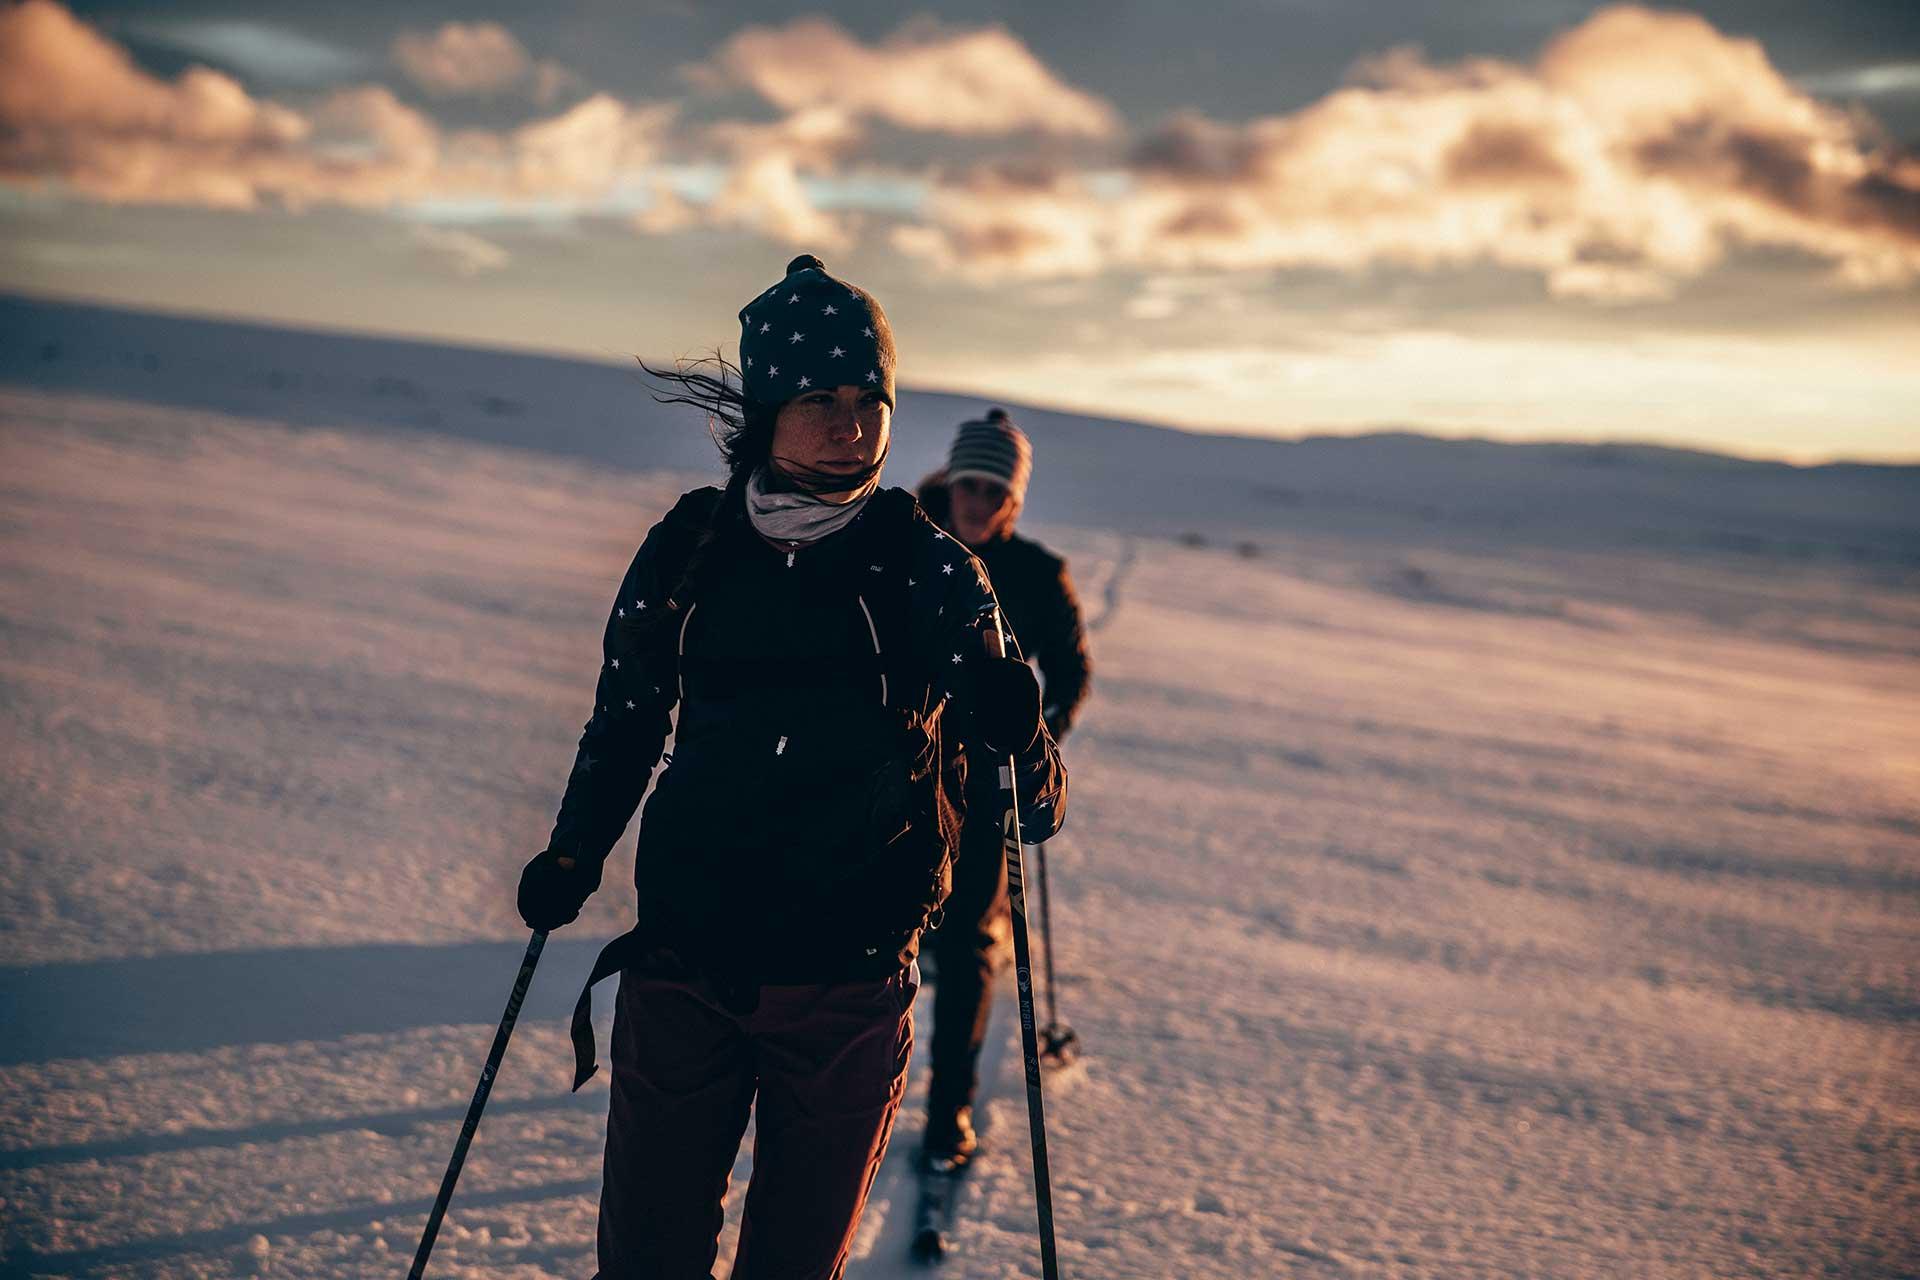 Sportfotograf Michael Müller Winter Langlauf Norwegen Skitour